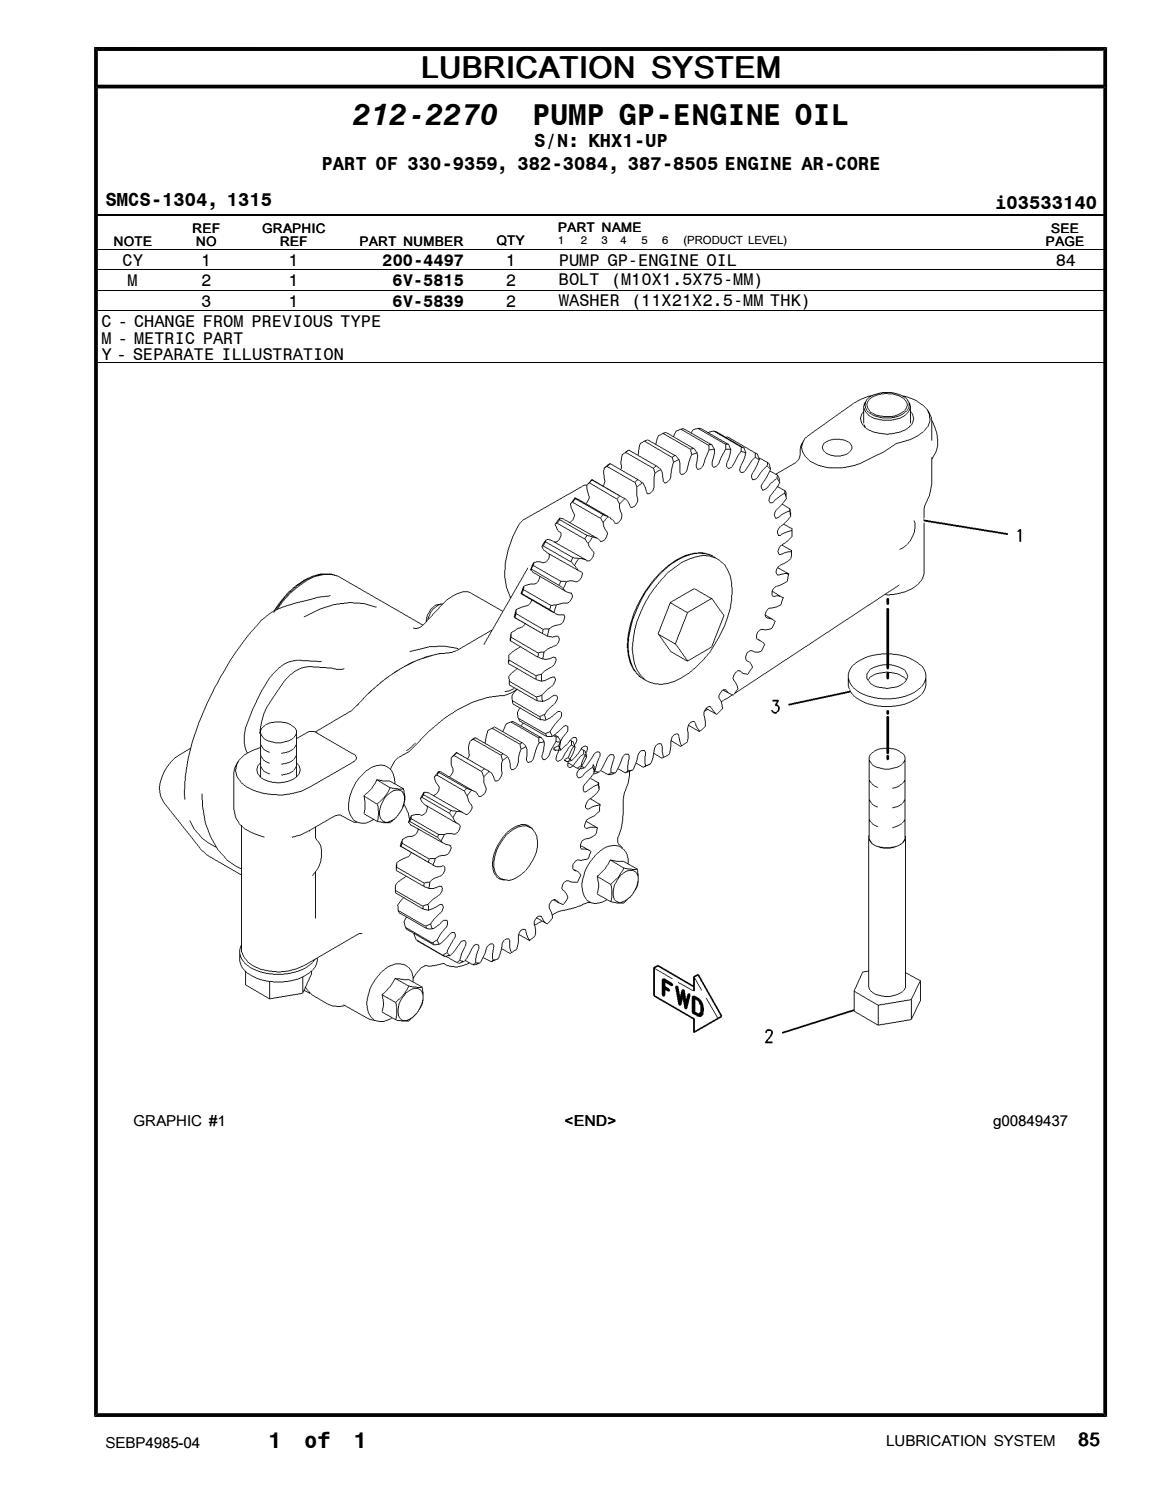 Parts Manual 120K Motor Grader # 1 by Ahmadfikry Work - issuu